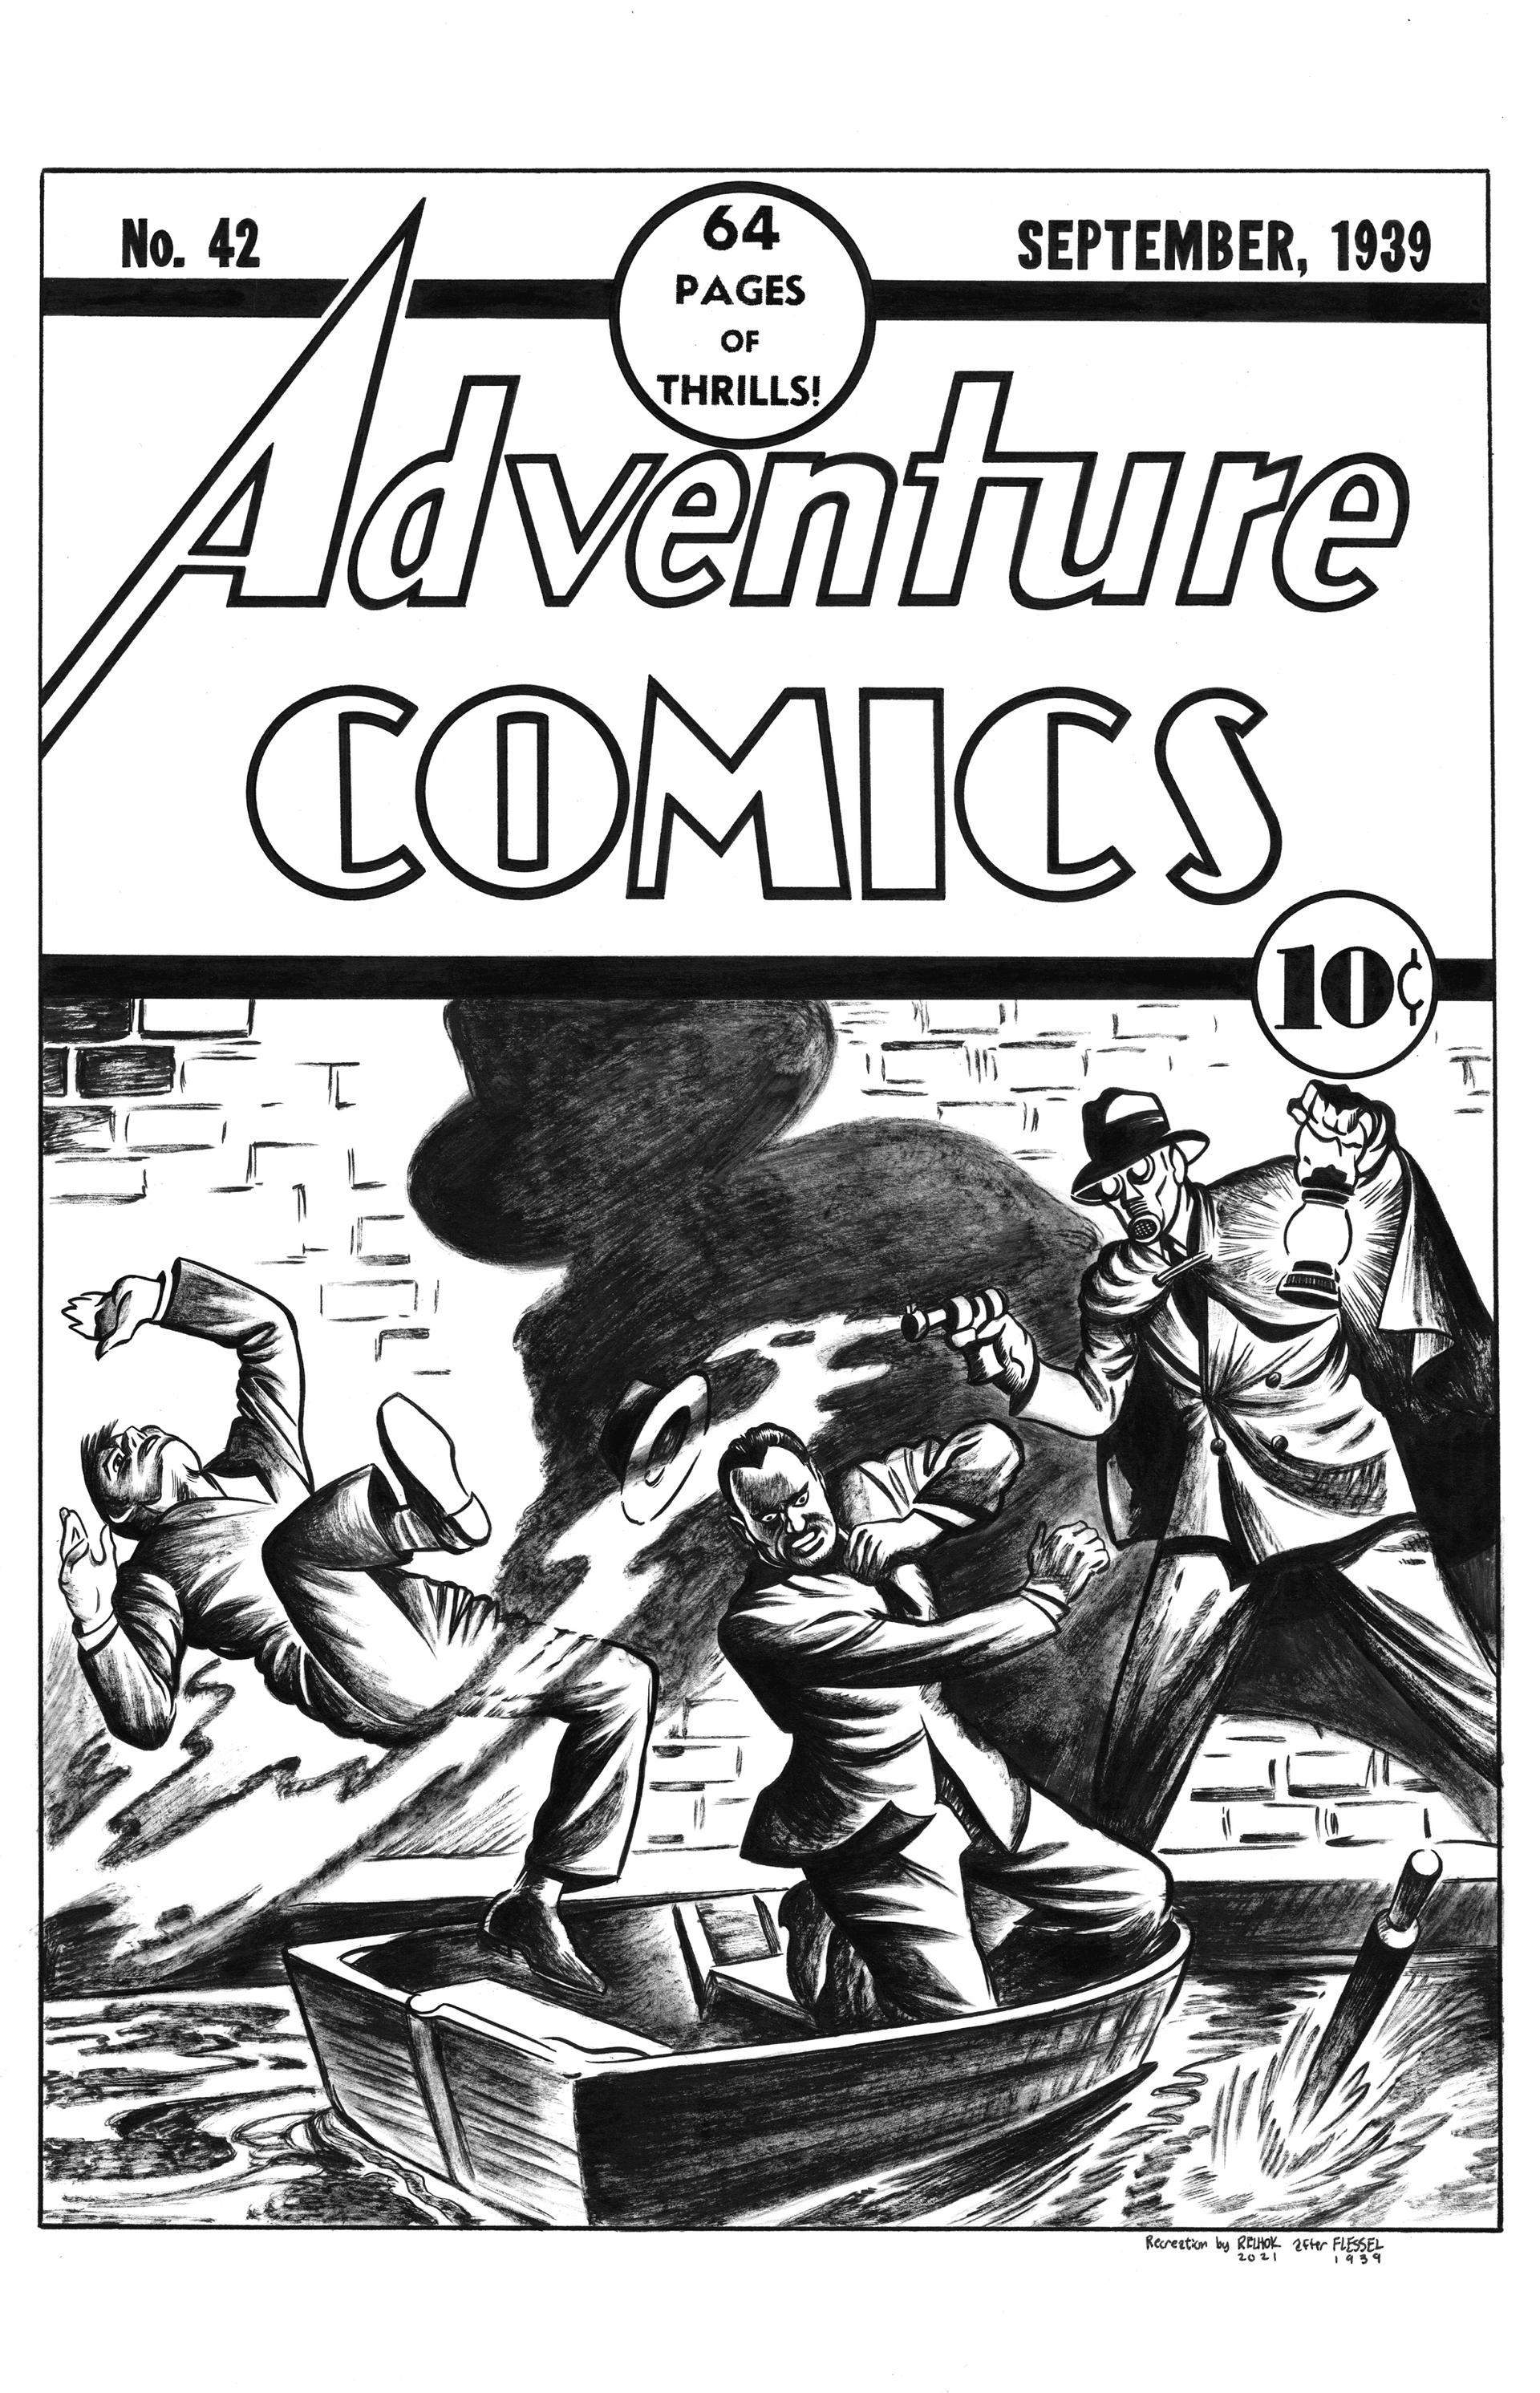 Adventure Comics #42 Cover Recreation